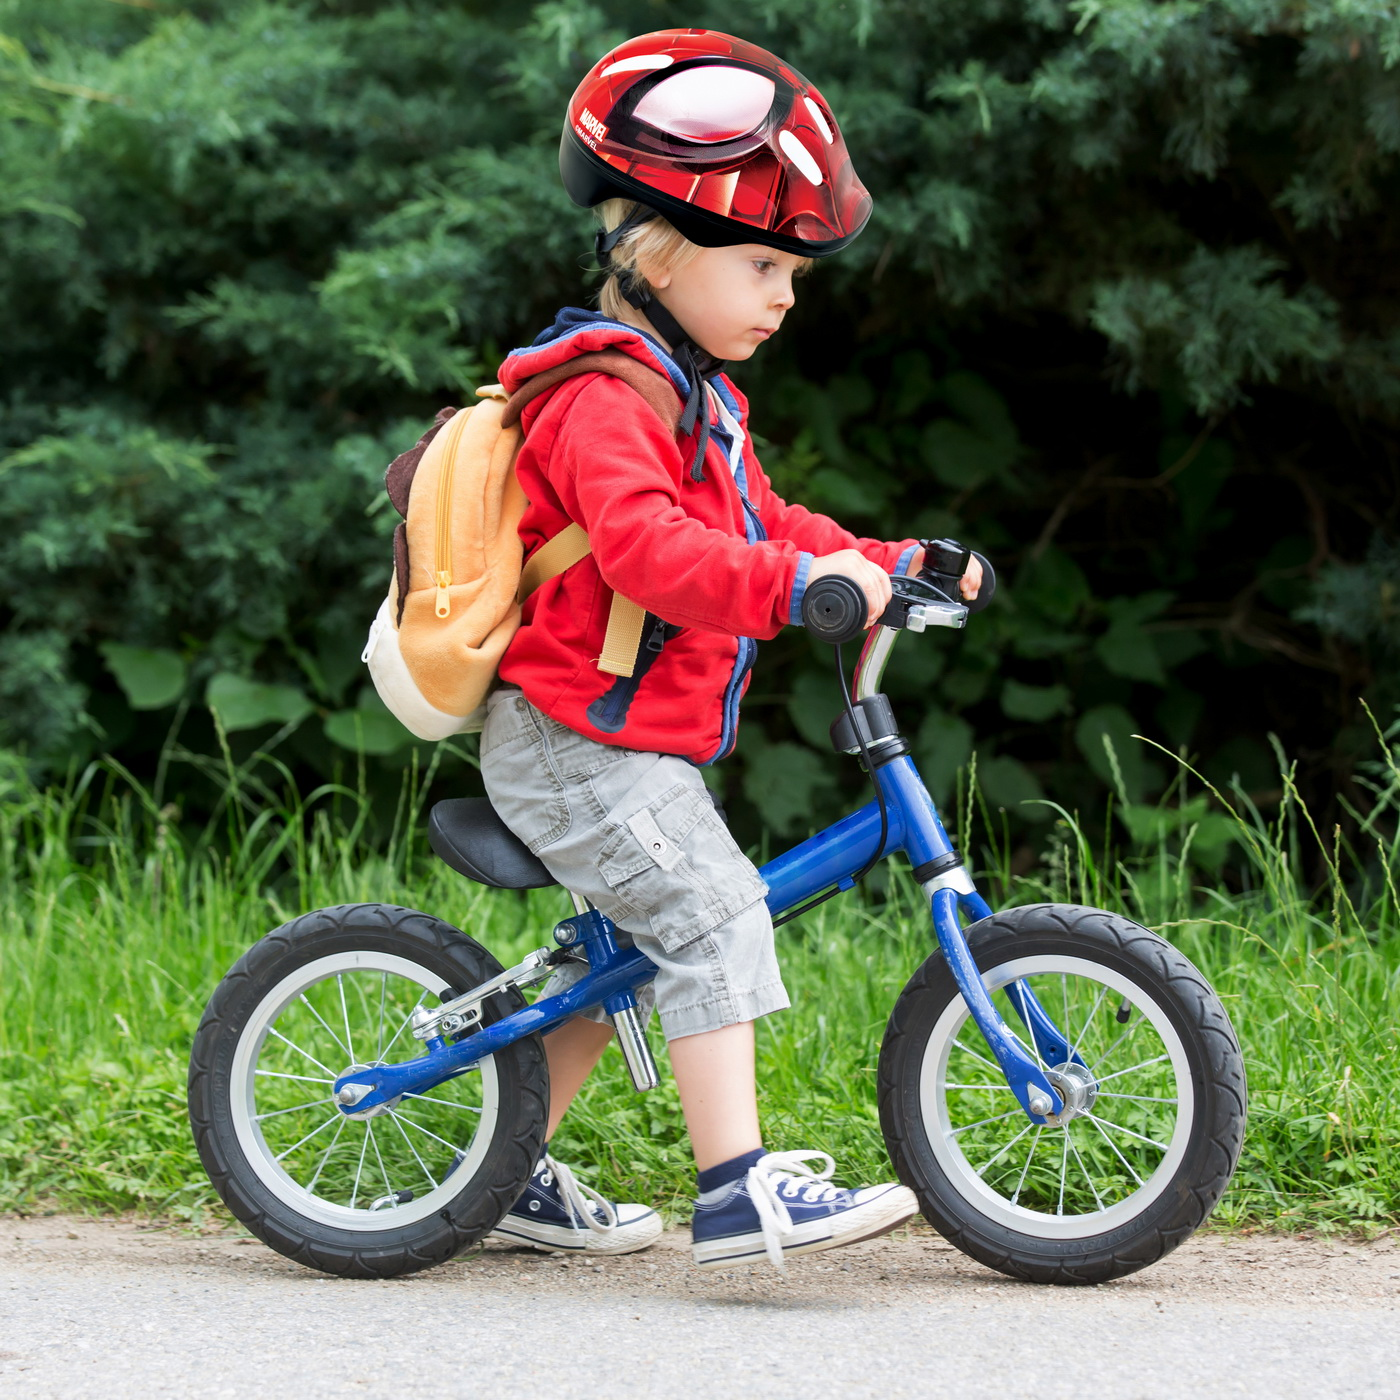 Cute toddler boy with blue helmet, riding balance bike on the street